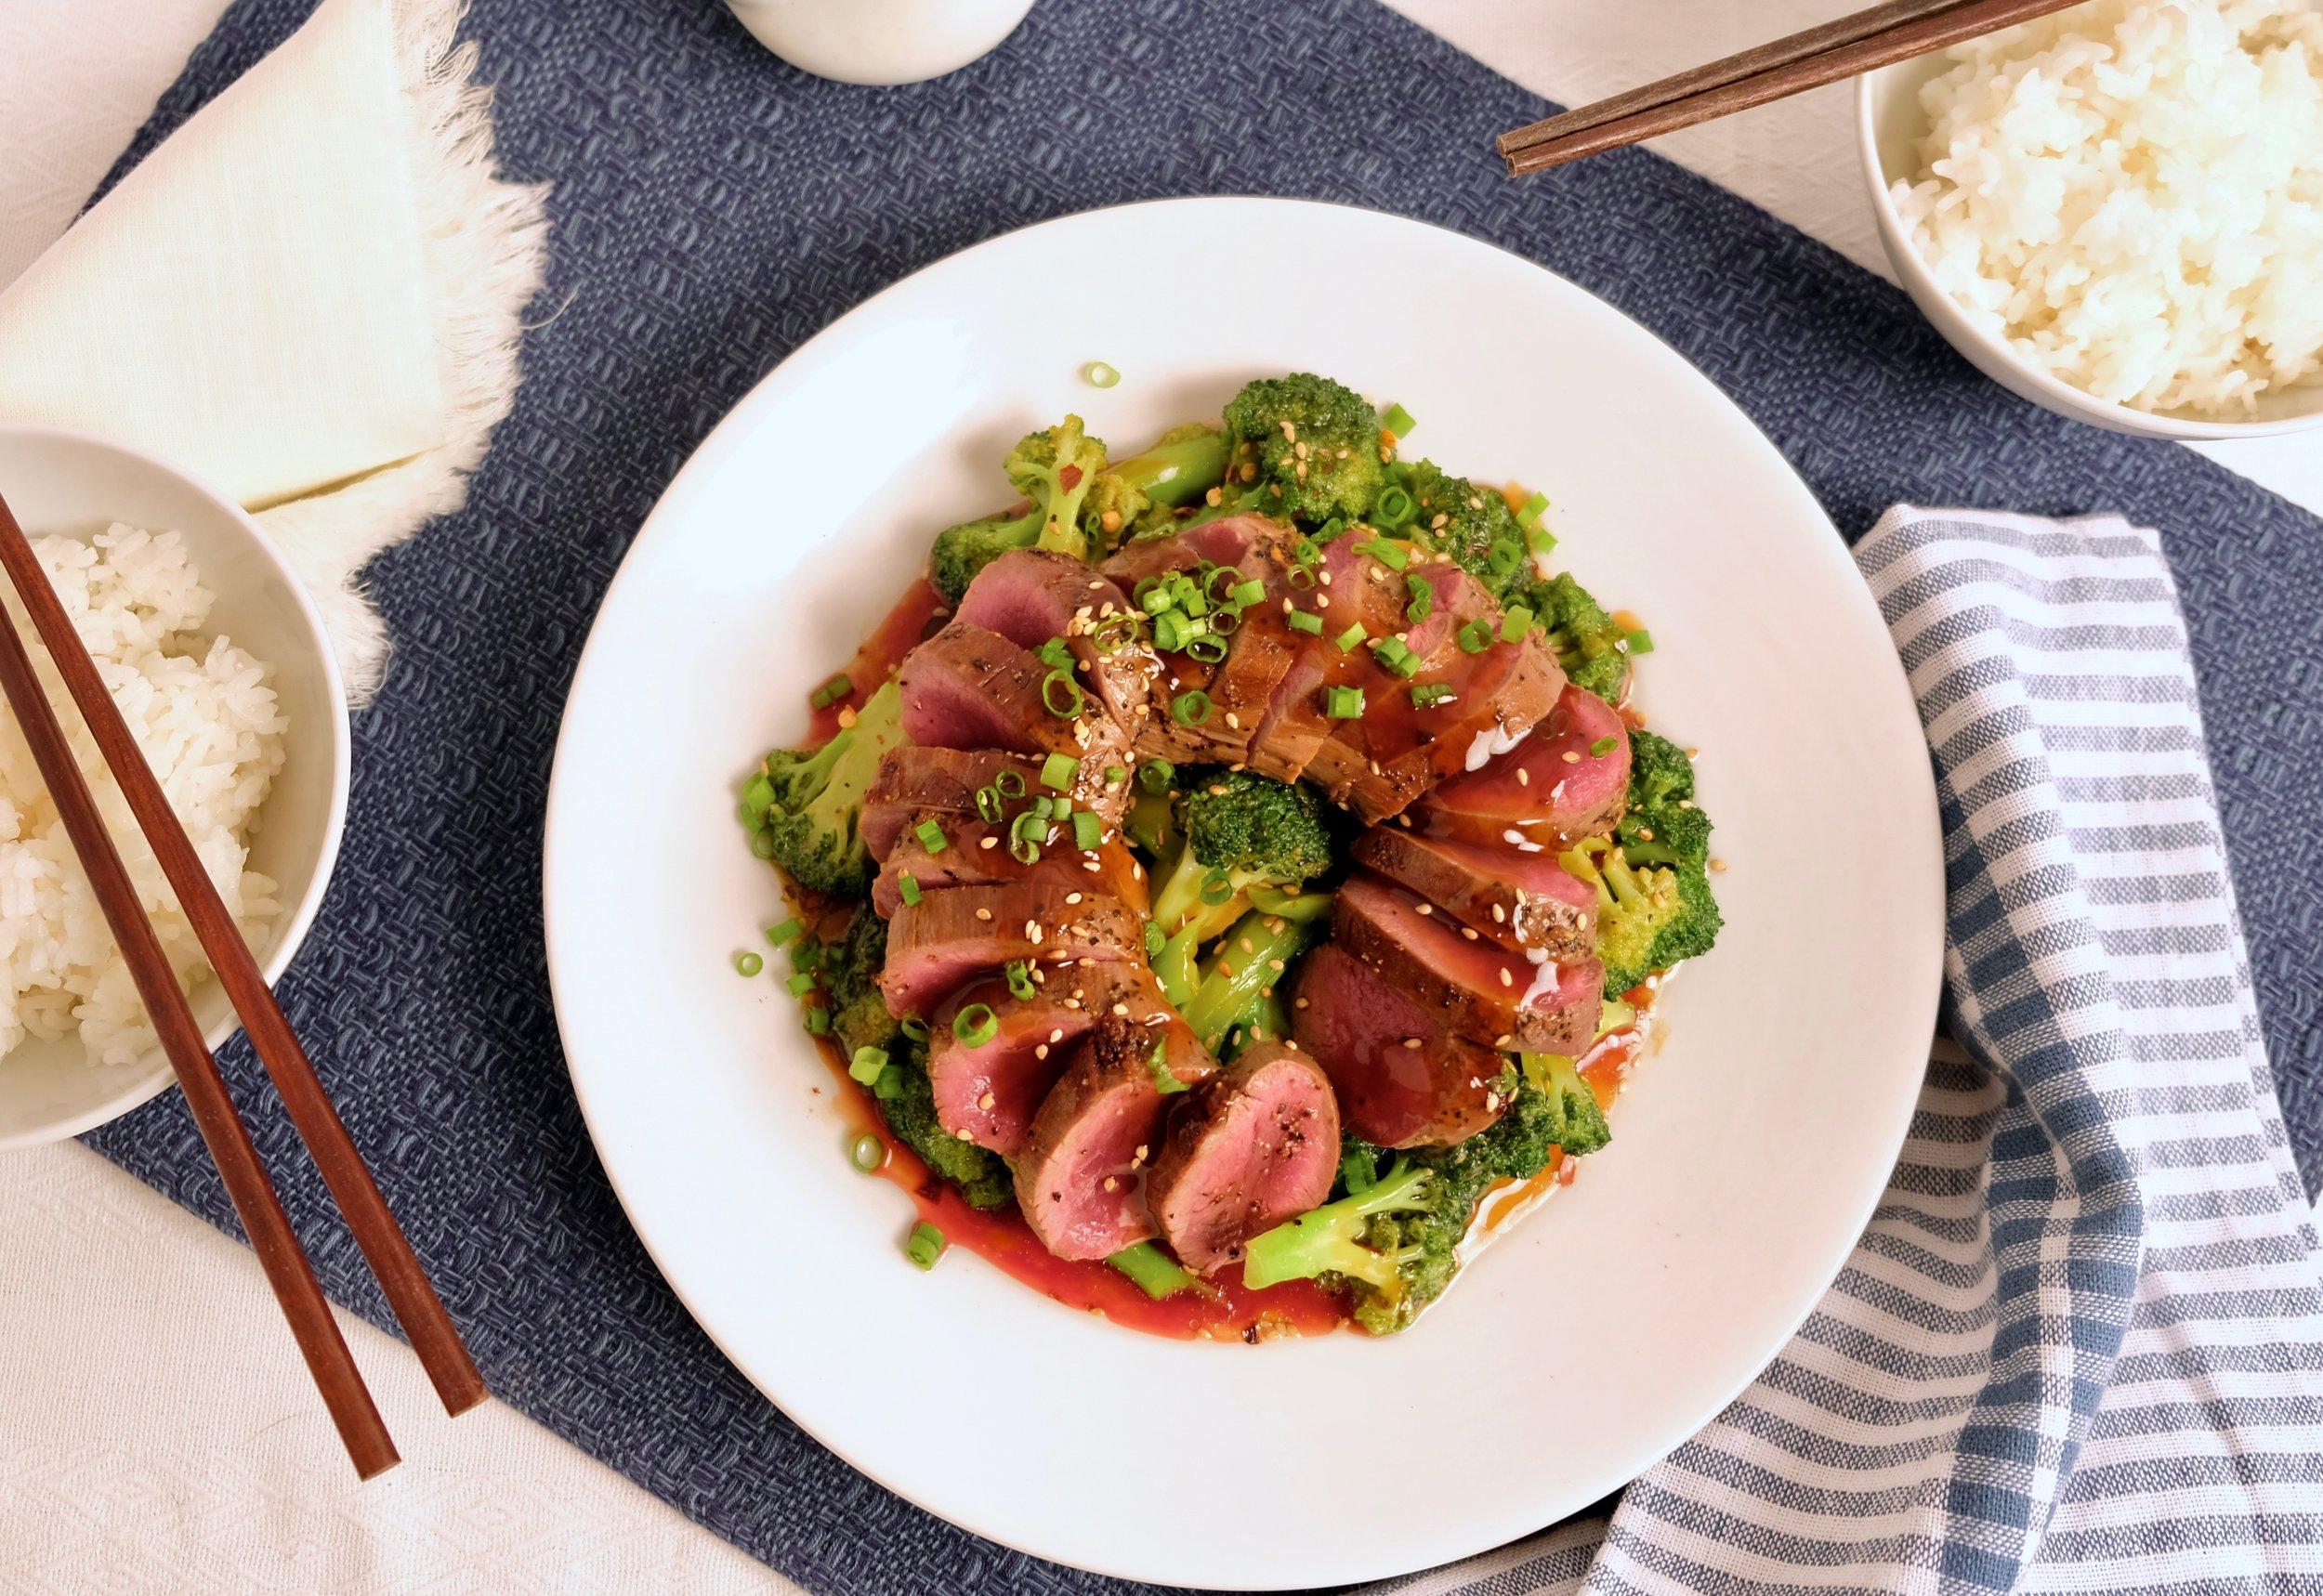 venison & broccoli.jpg